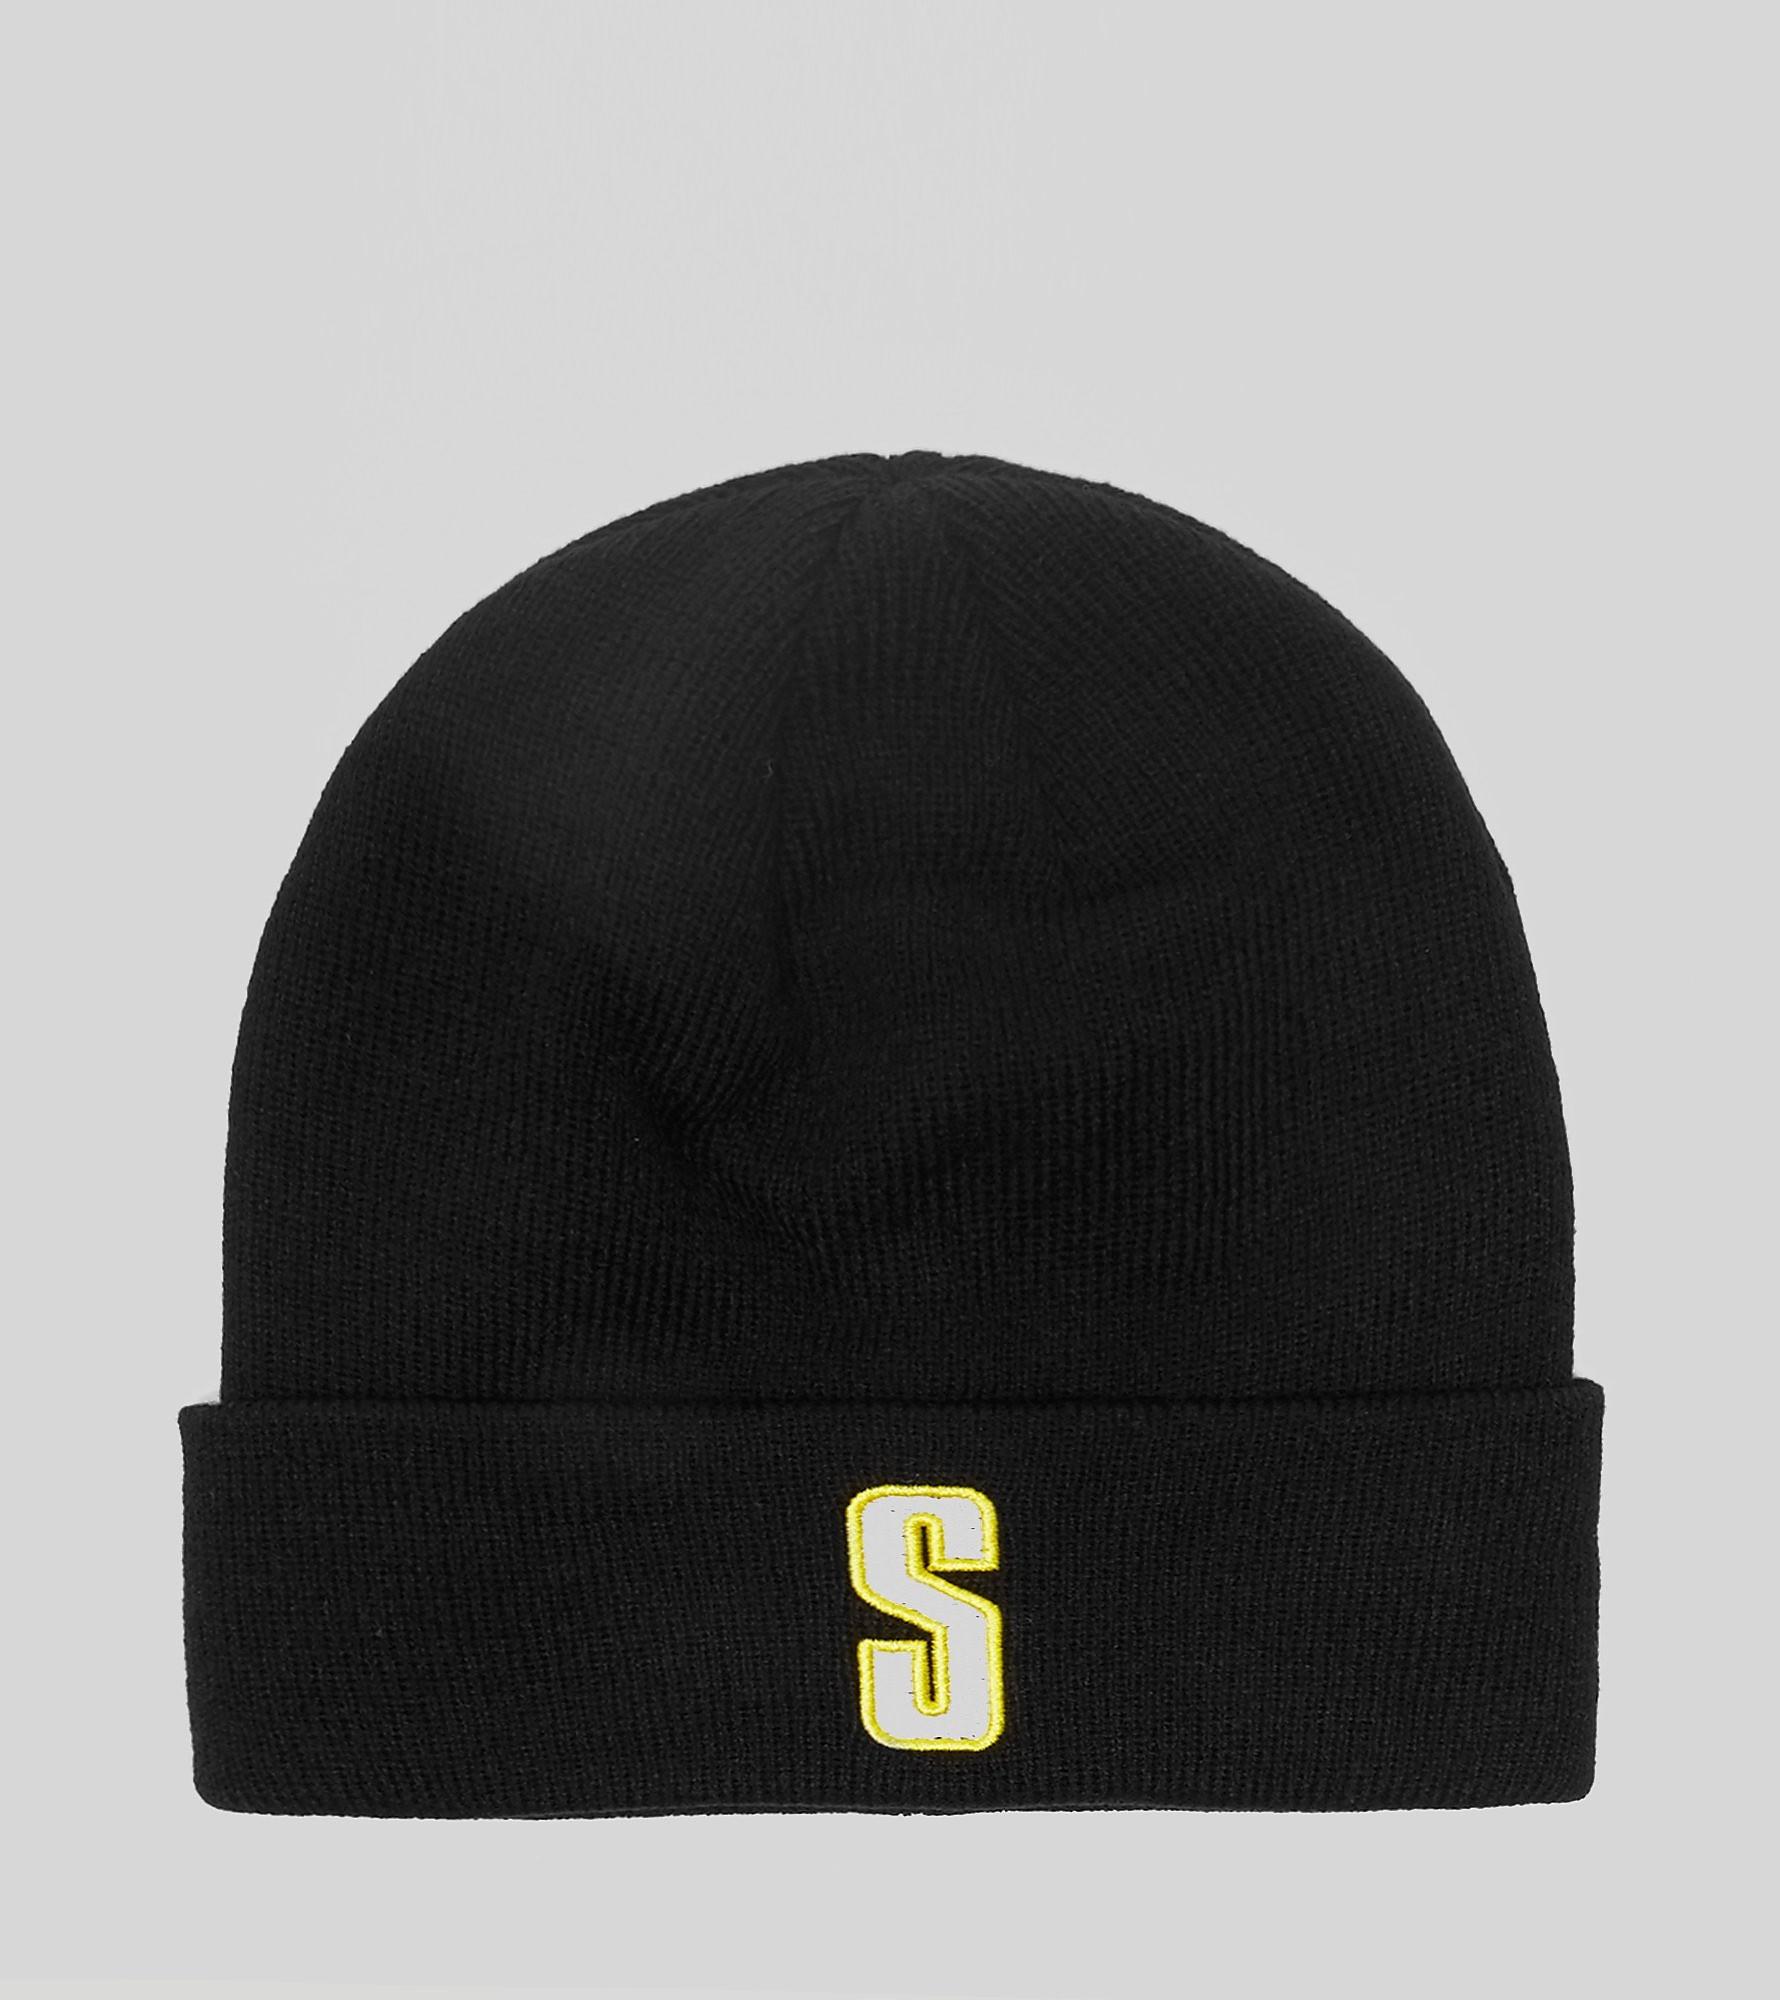 Stussy Vintage 'S' Beanie Hat